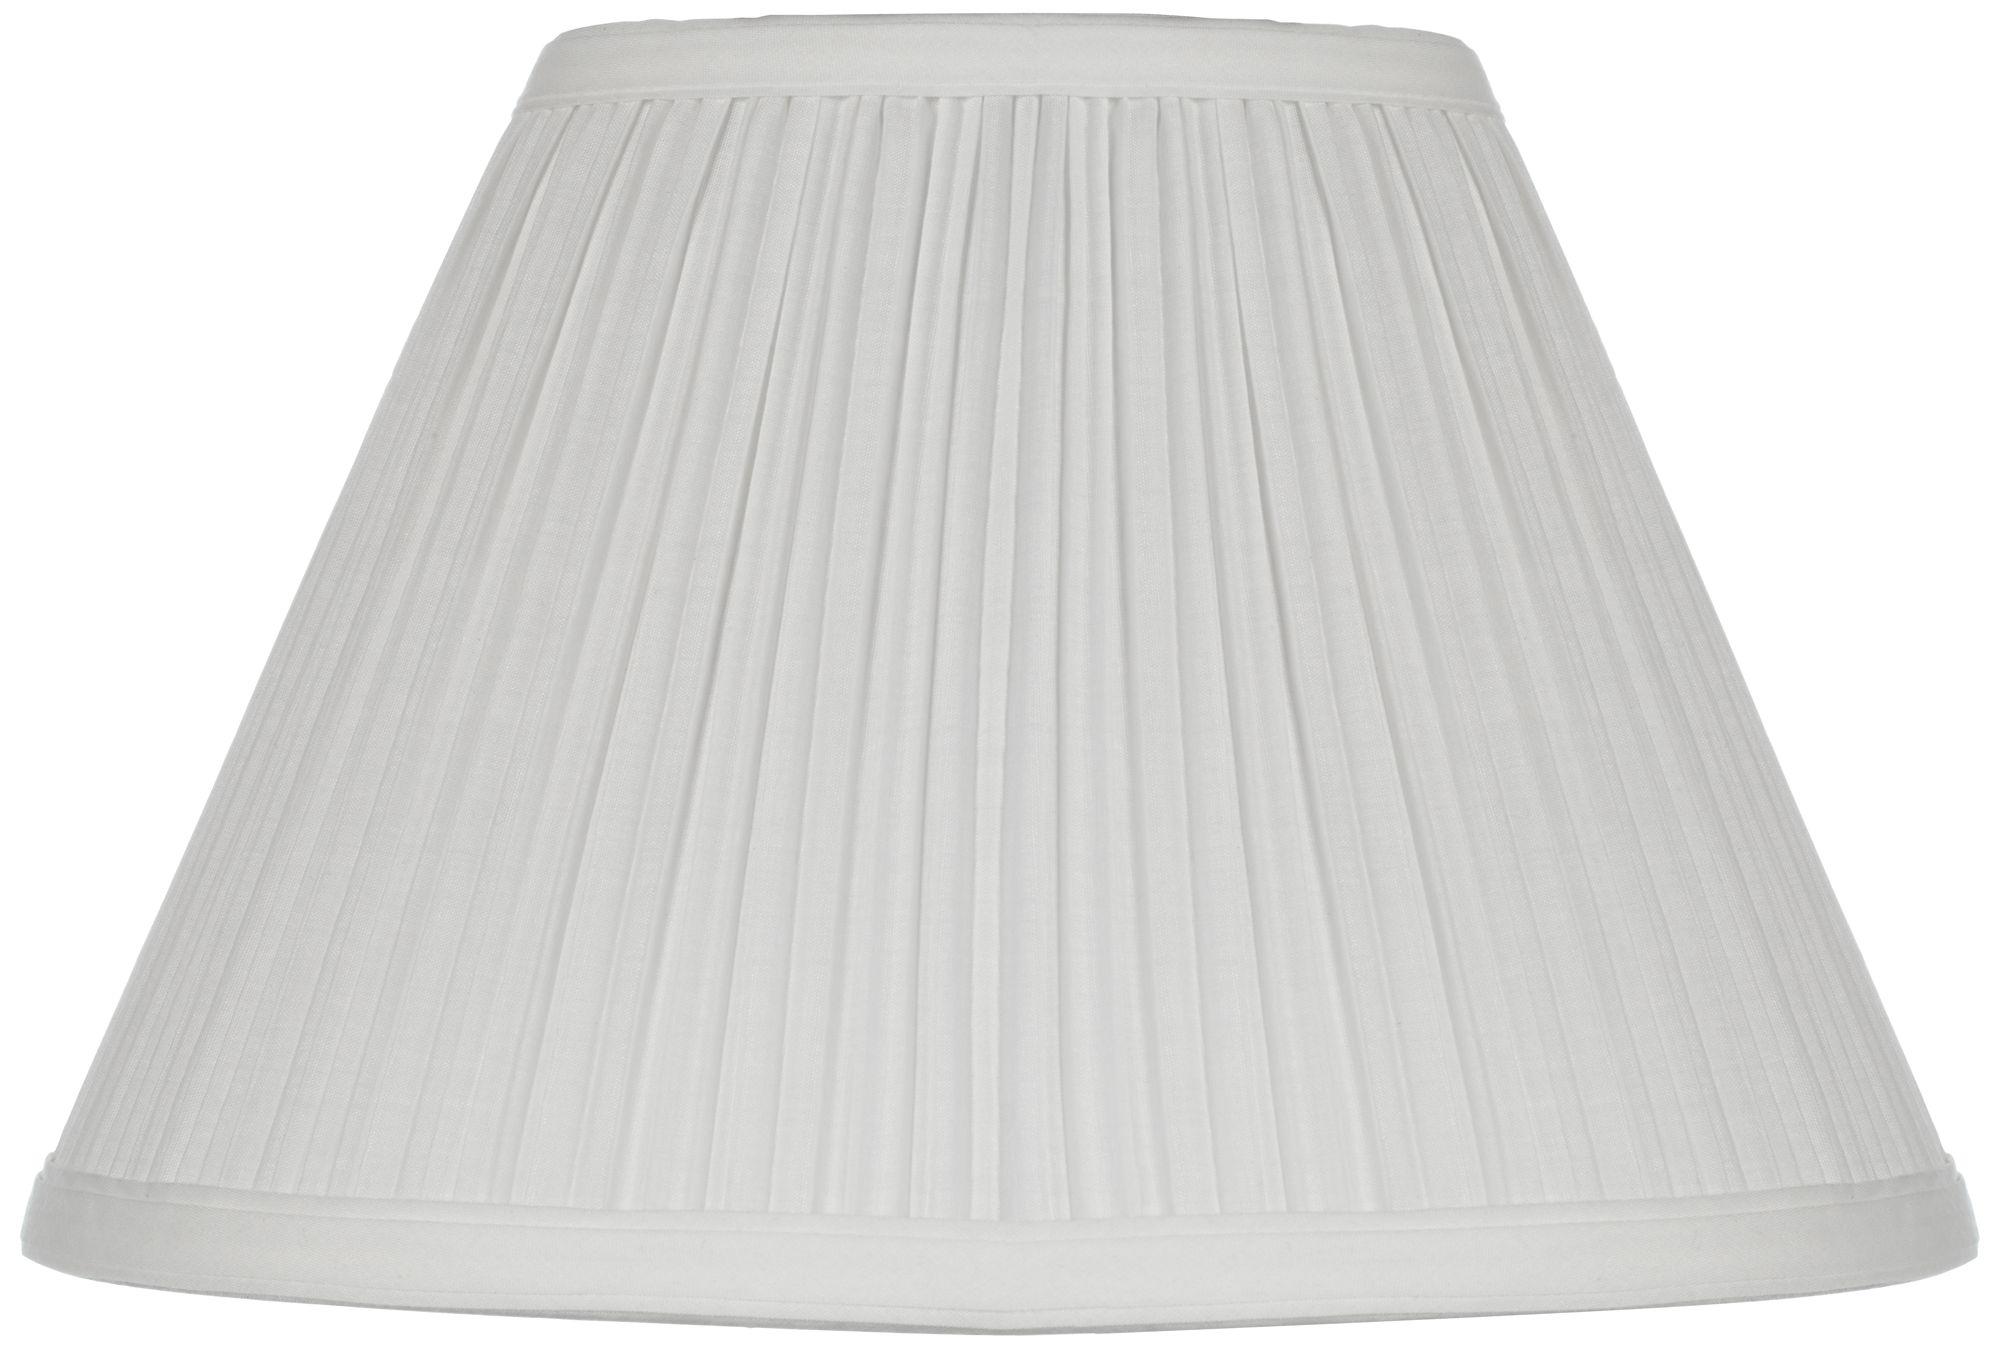 White Mushroom Pleated Lamp Shade 5x11x7.5 (Clip On)